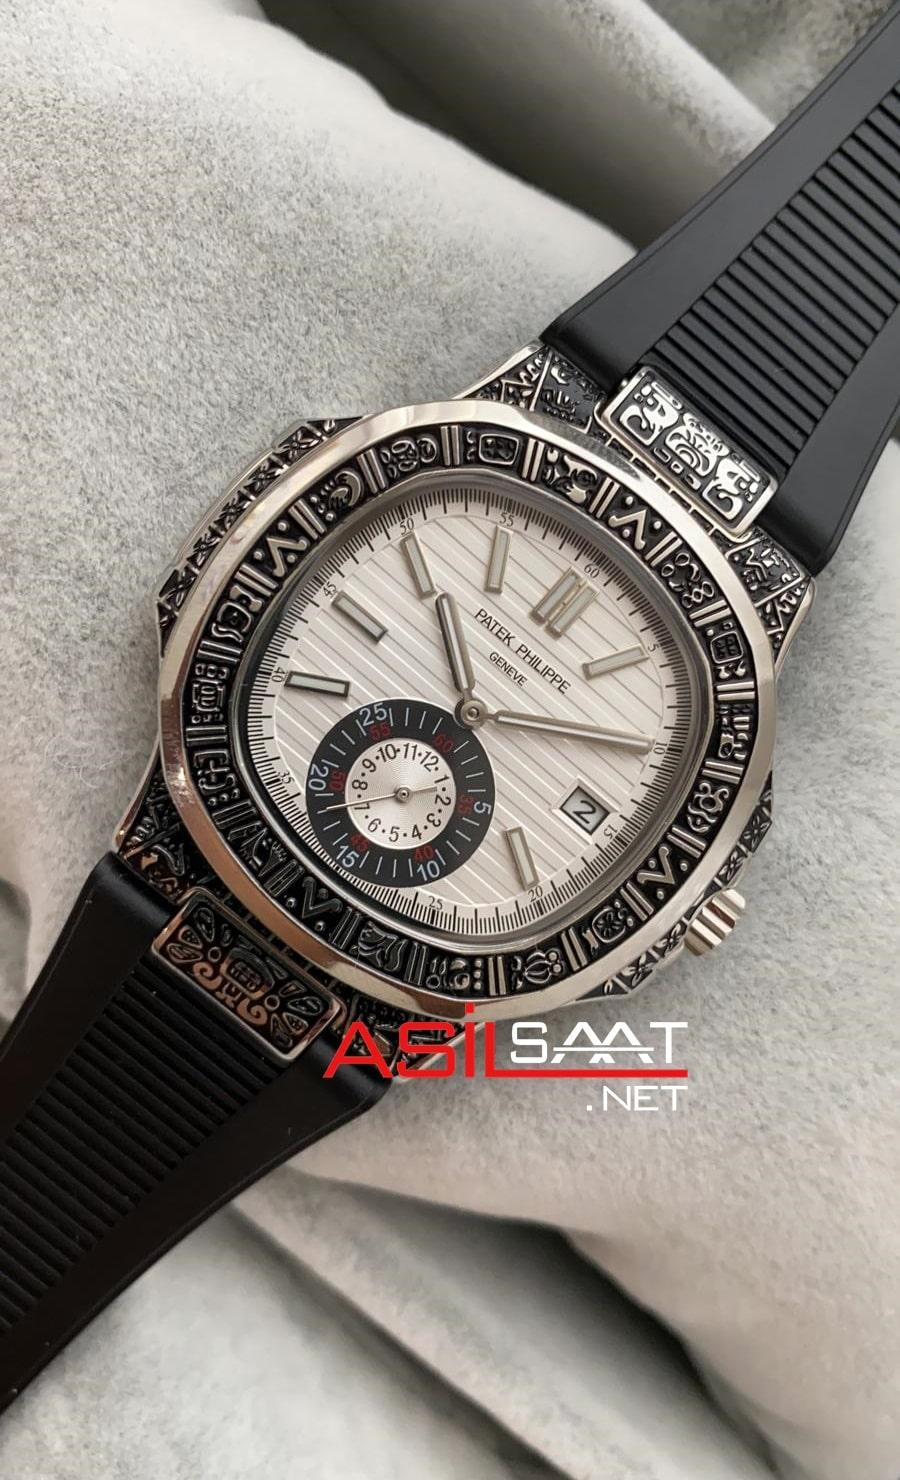 Patek Philippe Nautilus Silver İşlemeli Kasa Replika Saat PPNA034